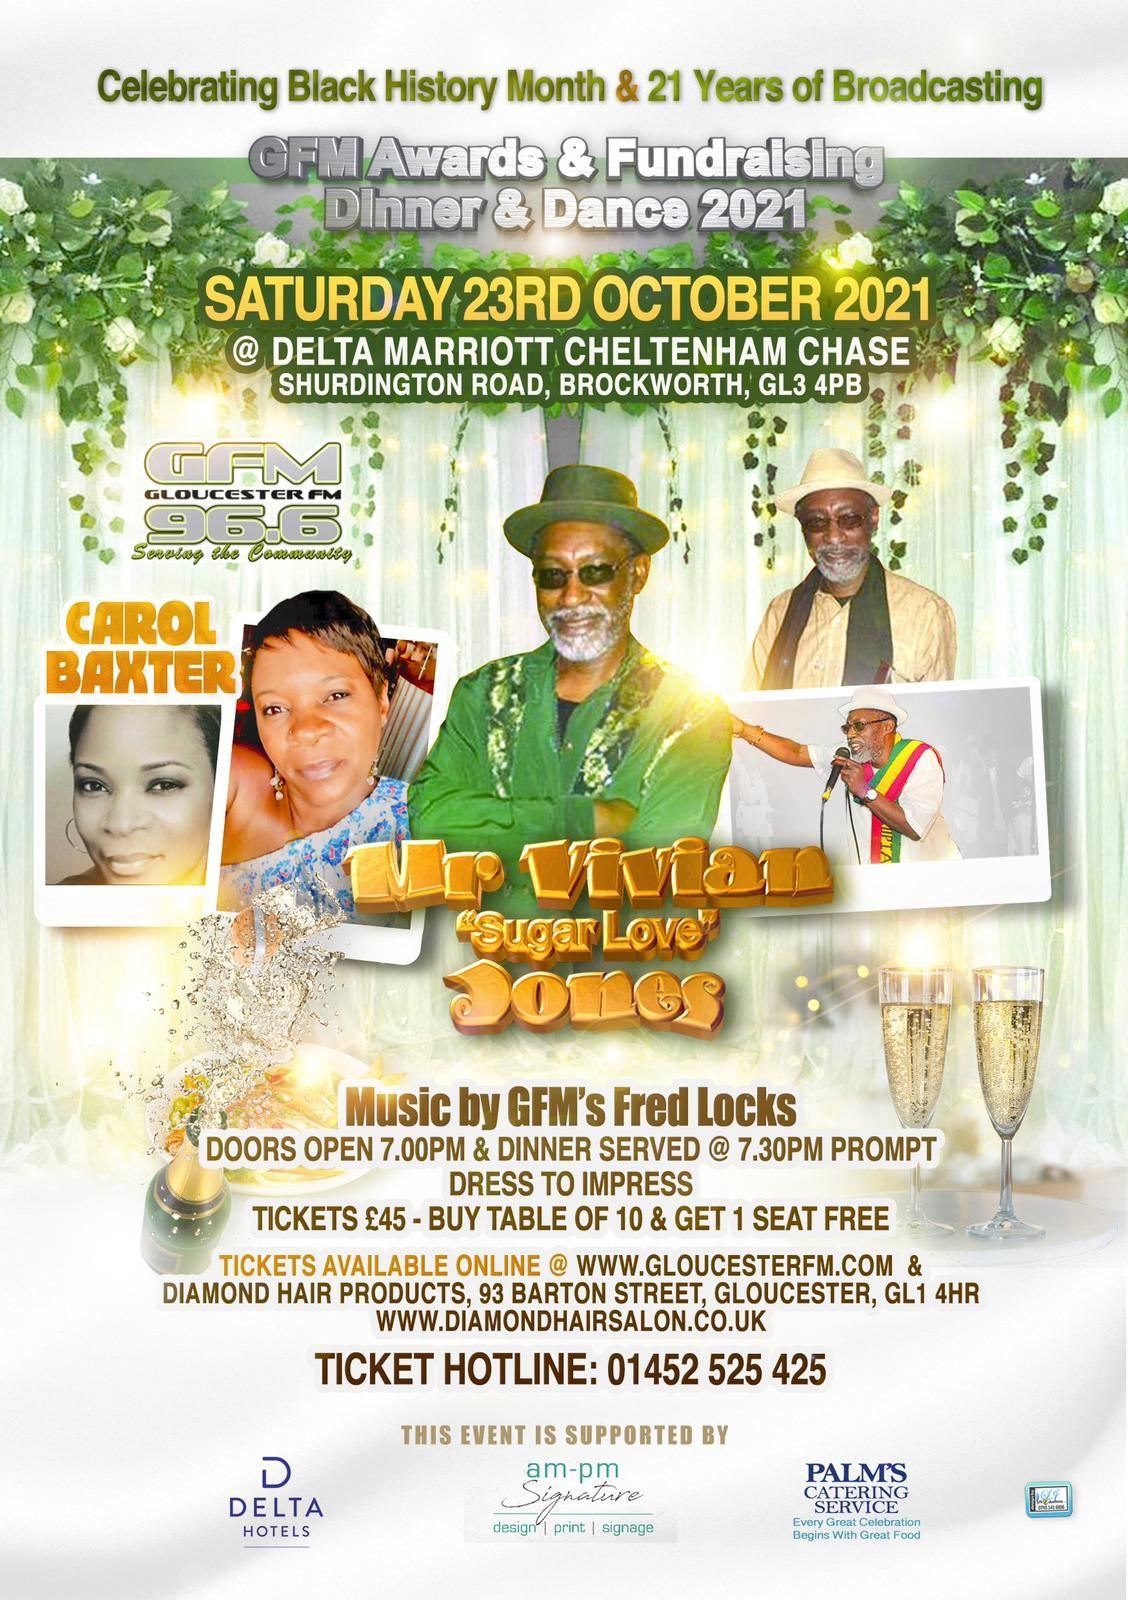 GFM Awards & Fundraising Dinner & Dance 2021